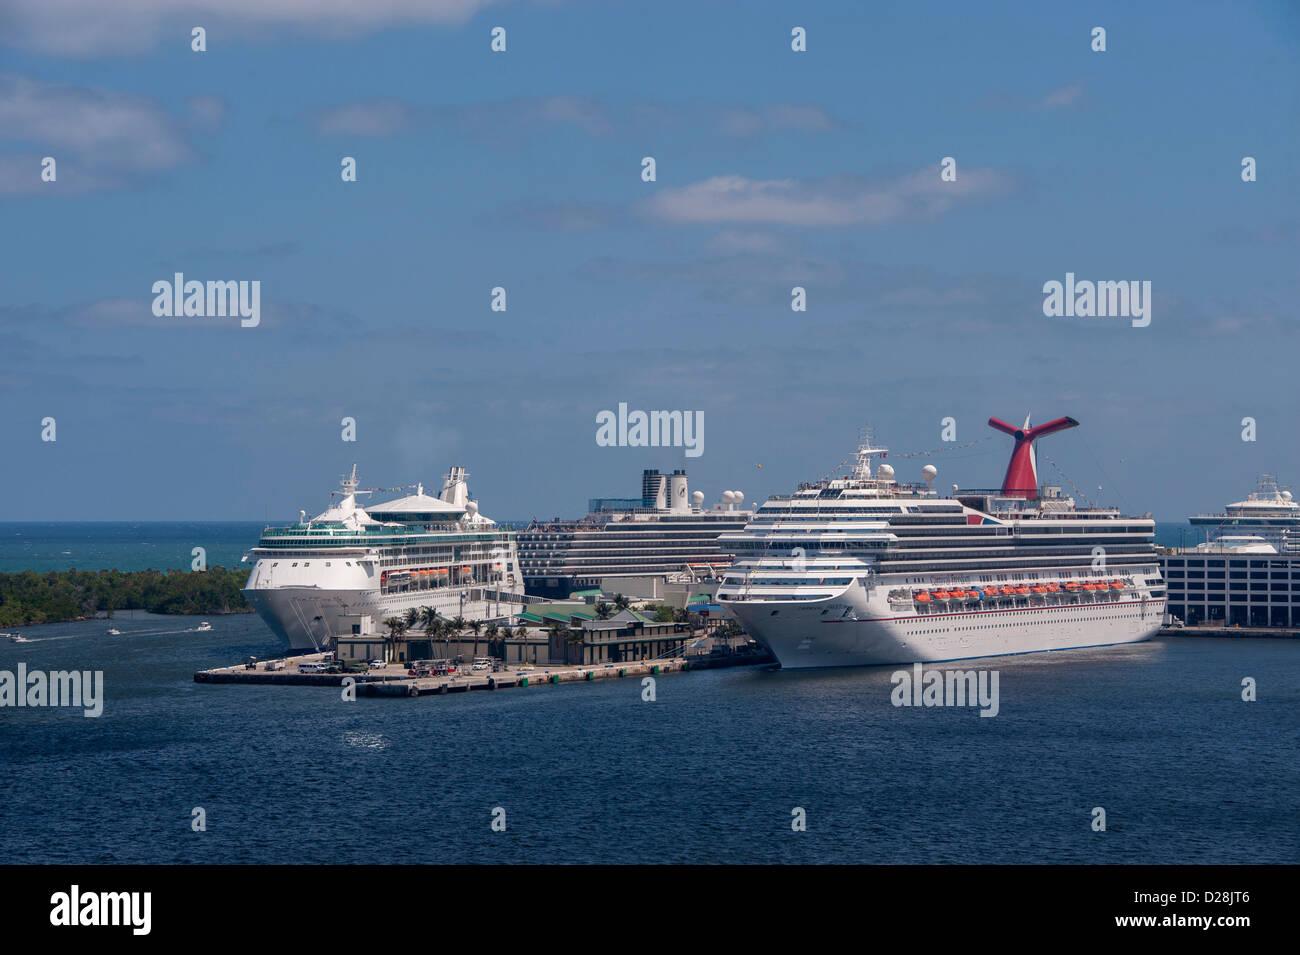 Fort Lauderdale Port Everglades Florida USA Cruise Ships Stock Photo Royalty Free Image ...